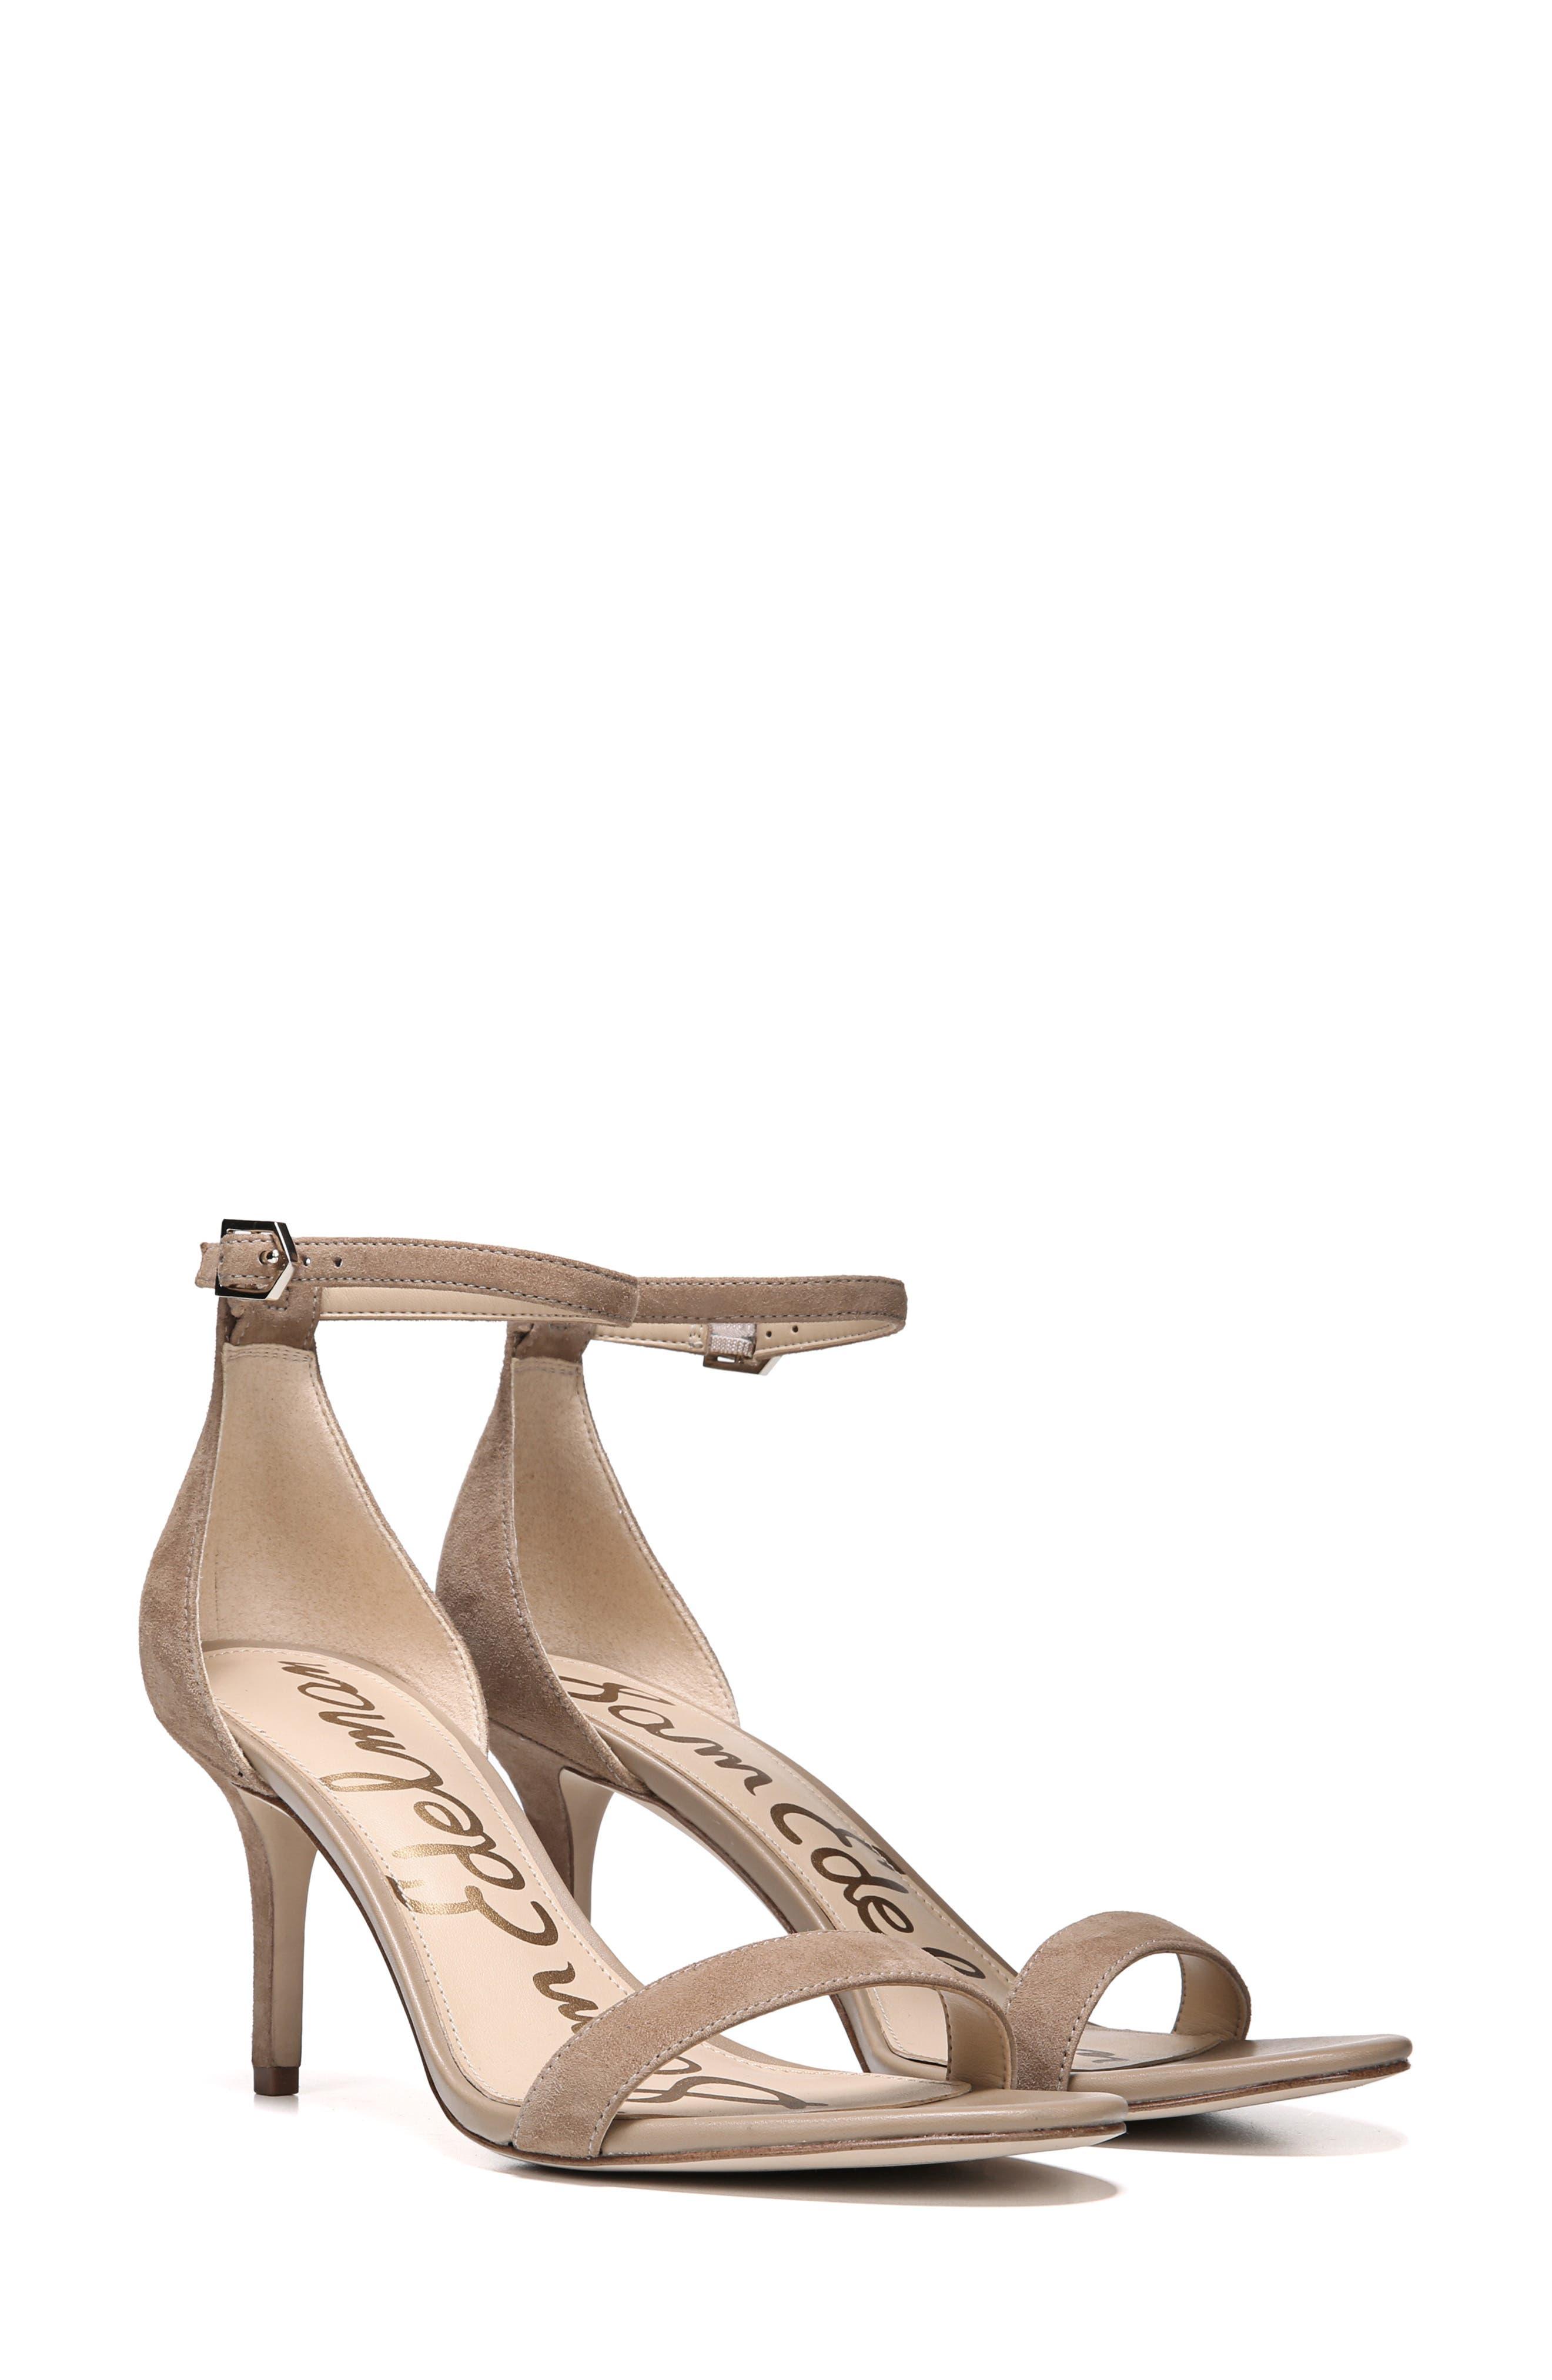 ,                             'Patti' Ankle Strap Sandal,                             Alternate thumbnail 95, color,                             254